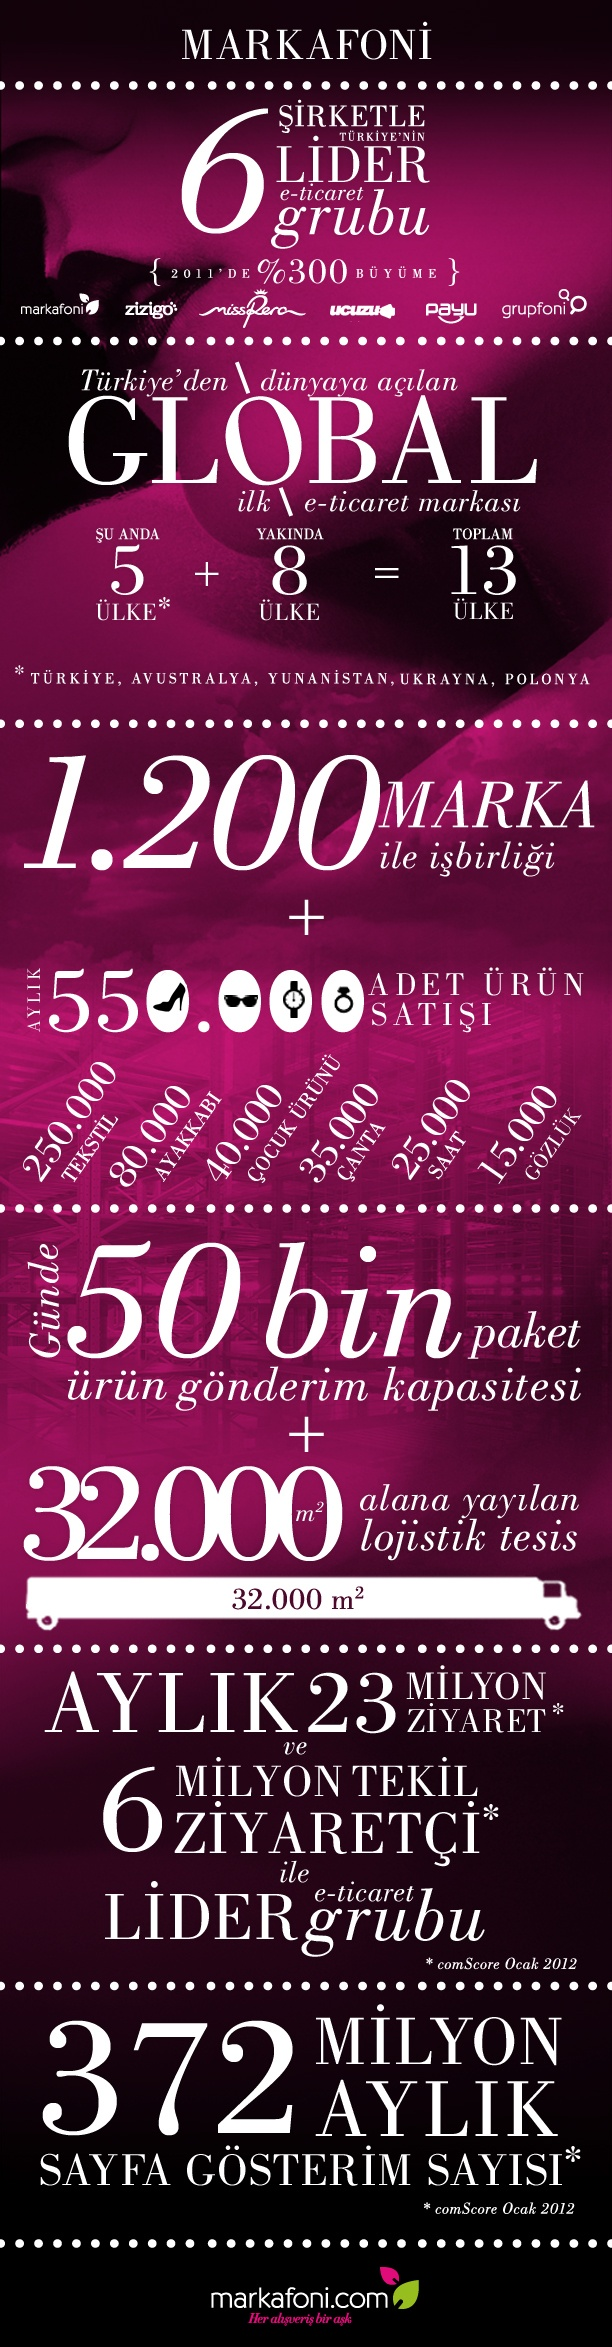 markafoni infographic